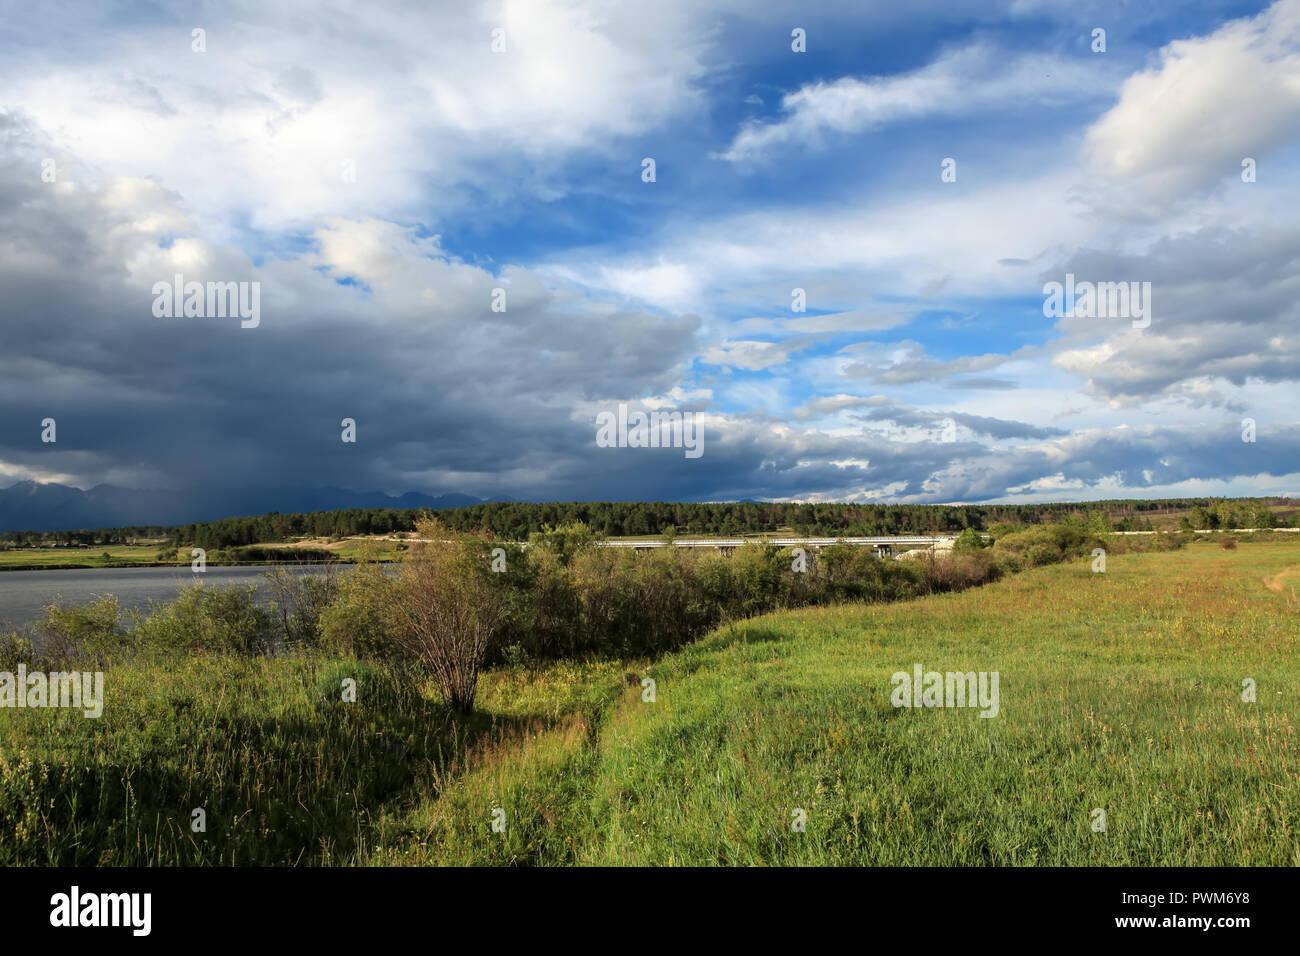 Movement of clouds on the river Irkut. Irkutsk Oblast, Russia. - Stock Image